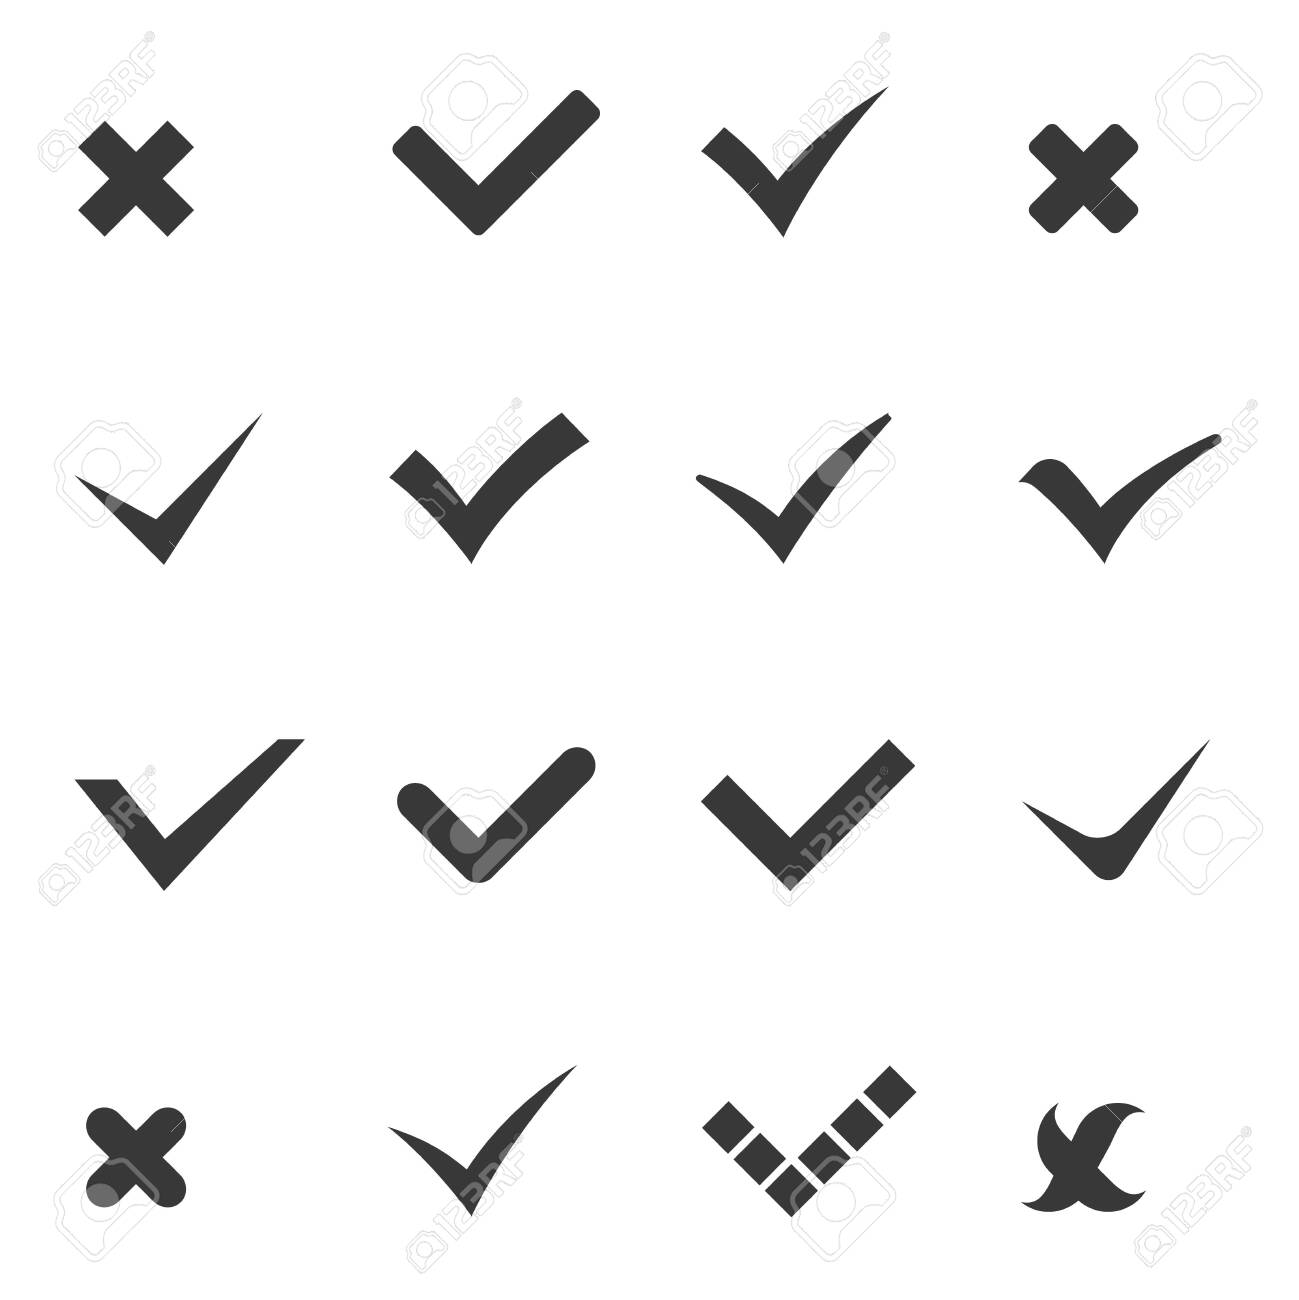 Check marks tick cross icons set vector illustration - 152402054